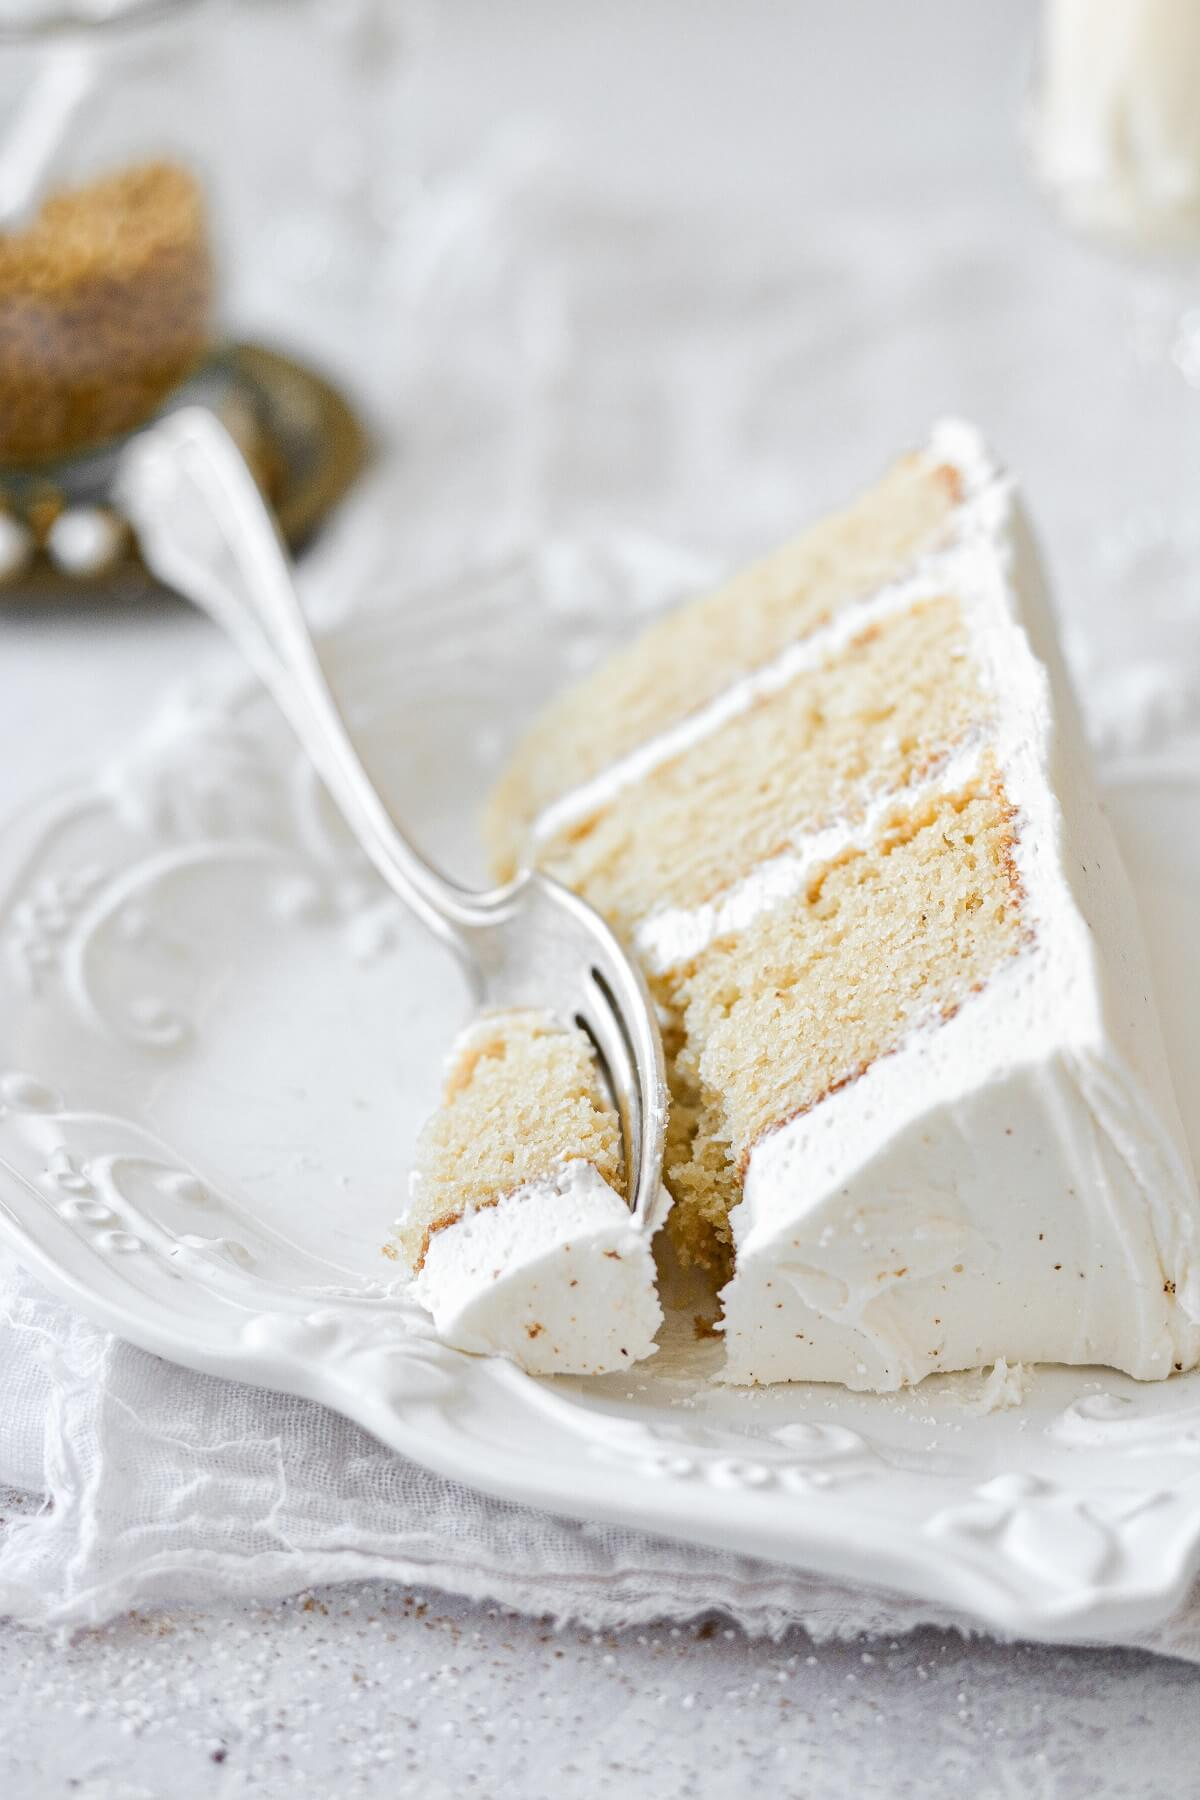 A slice of eggnog cake on a white plate.